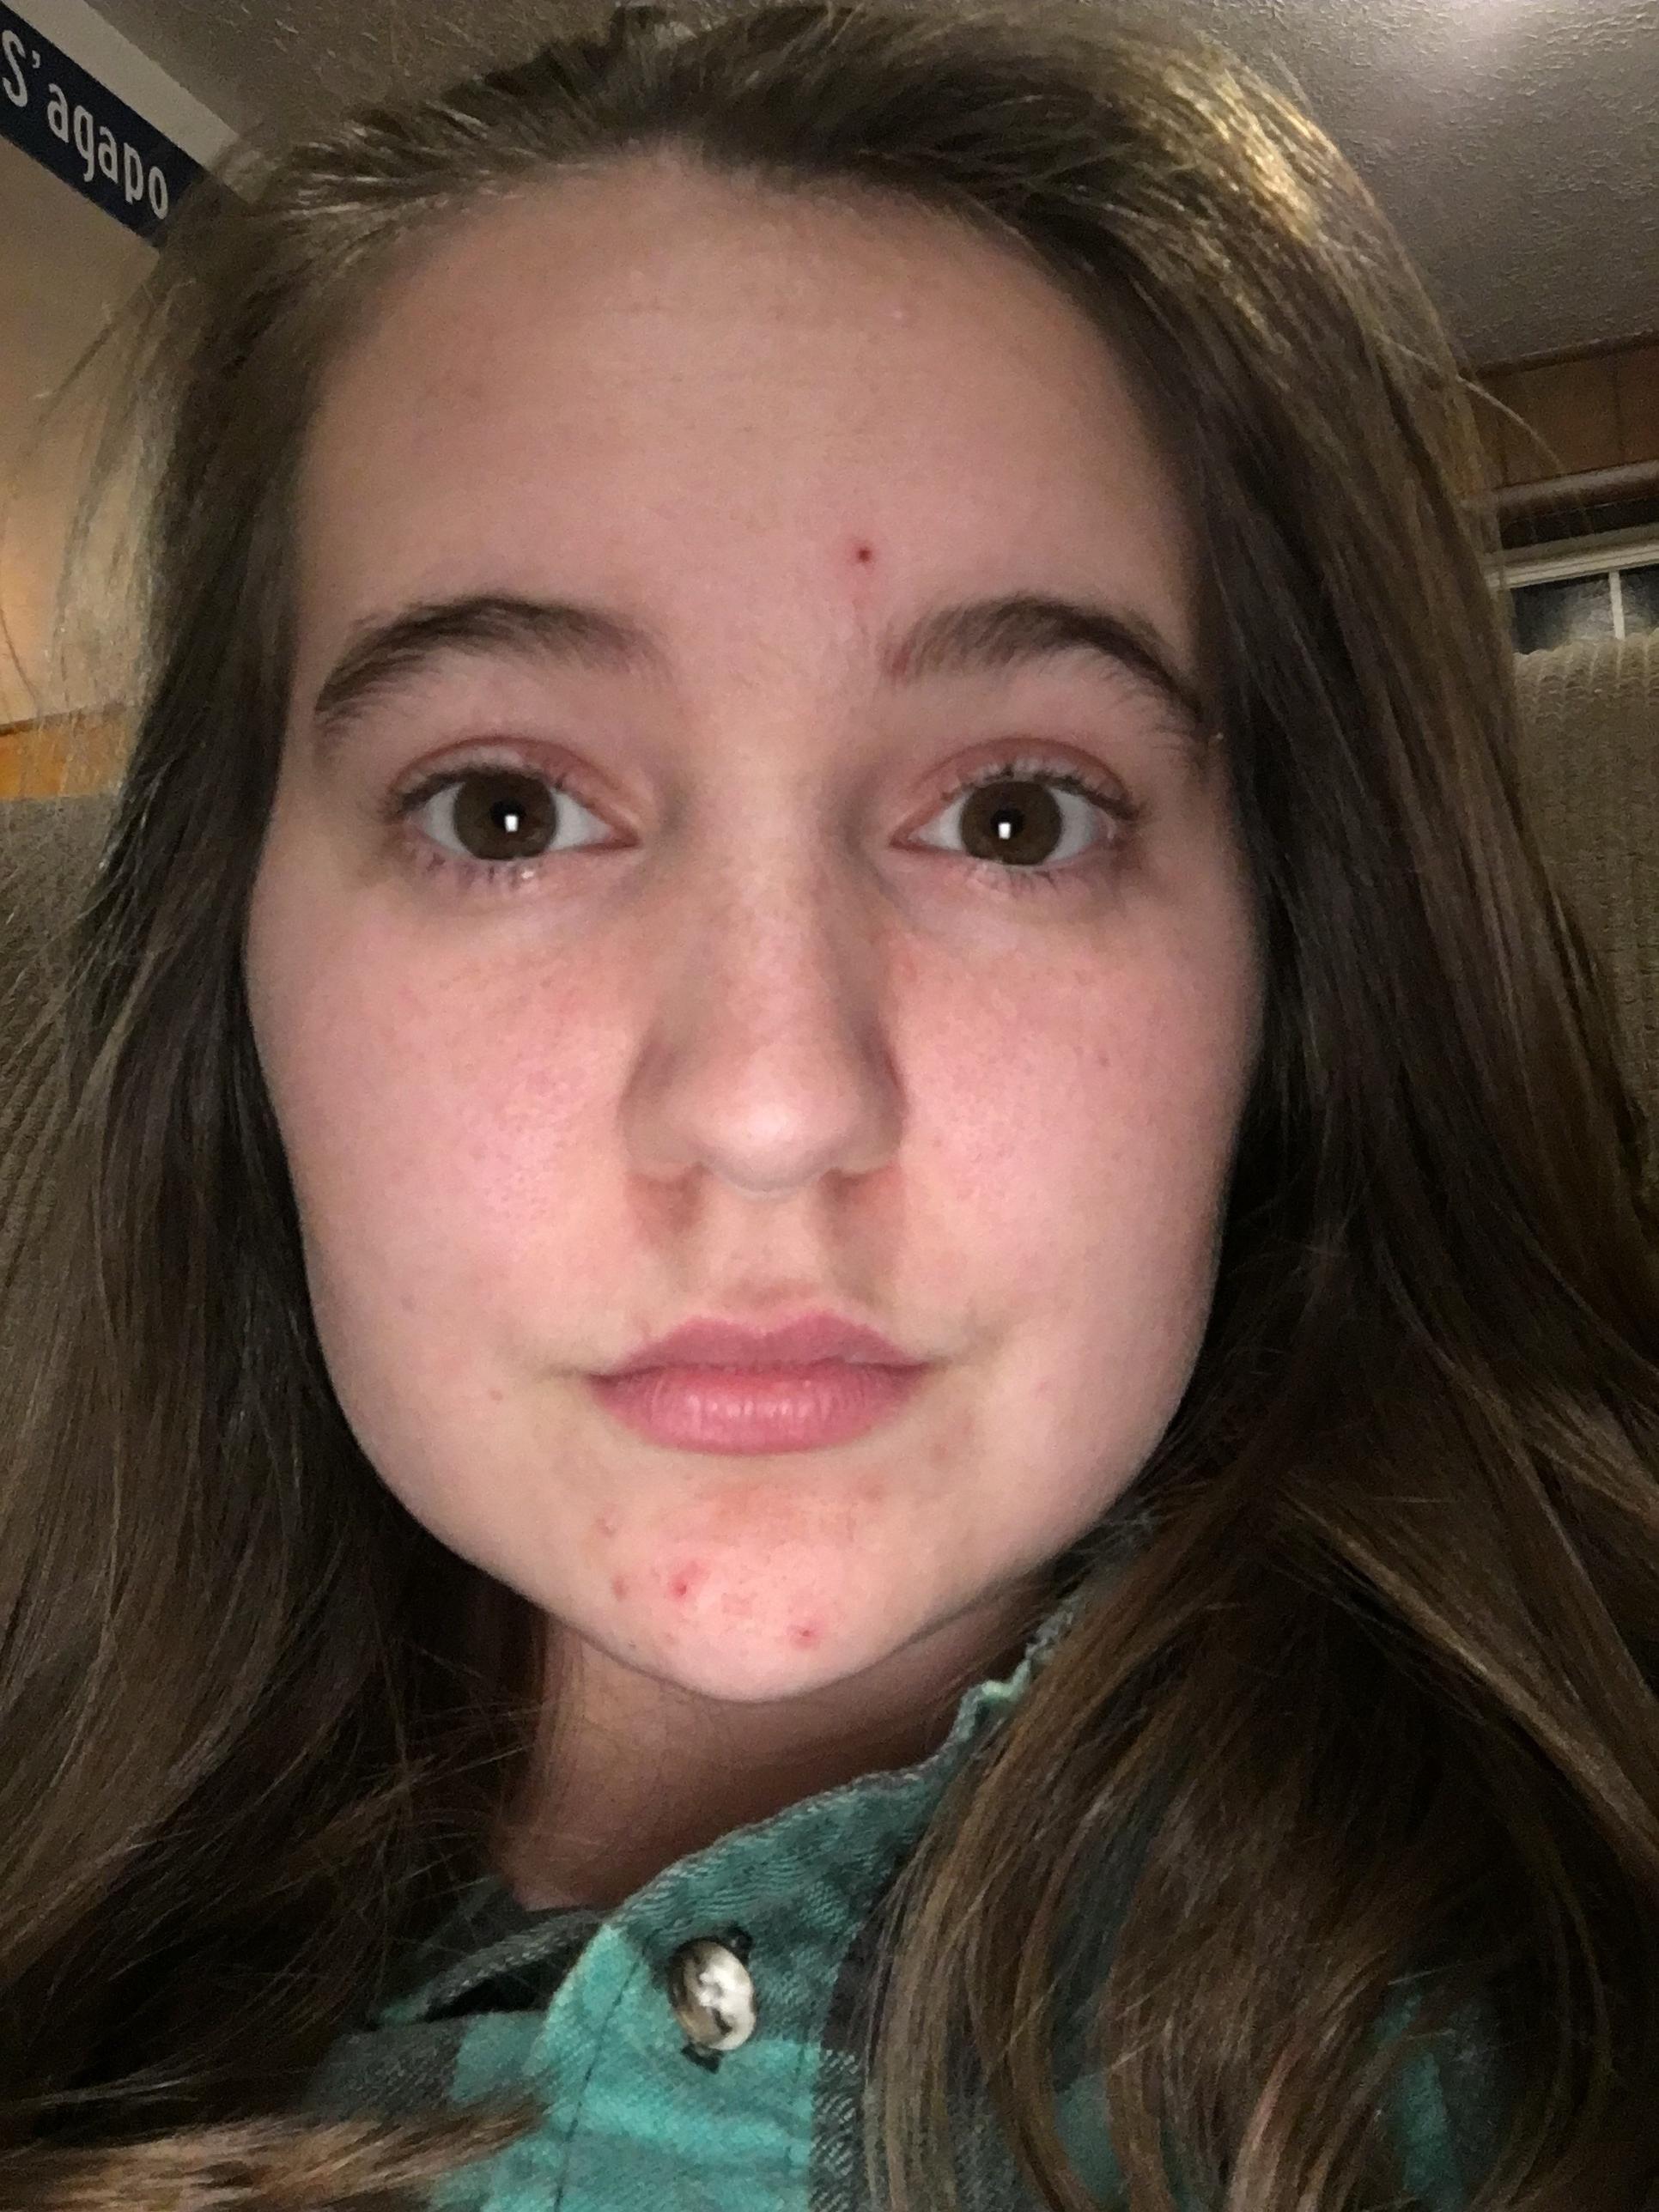 acne] ive had clear skin all my life. until i had a mandatory birth